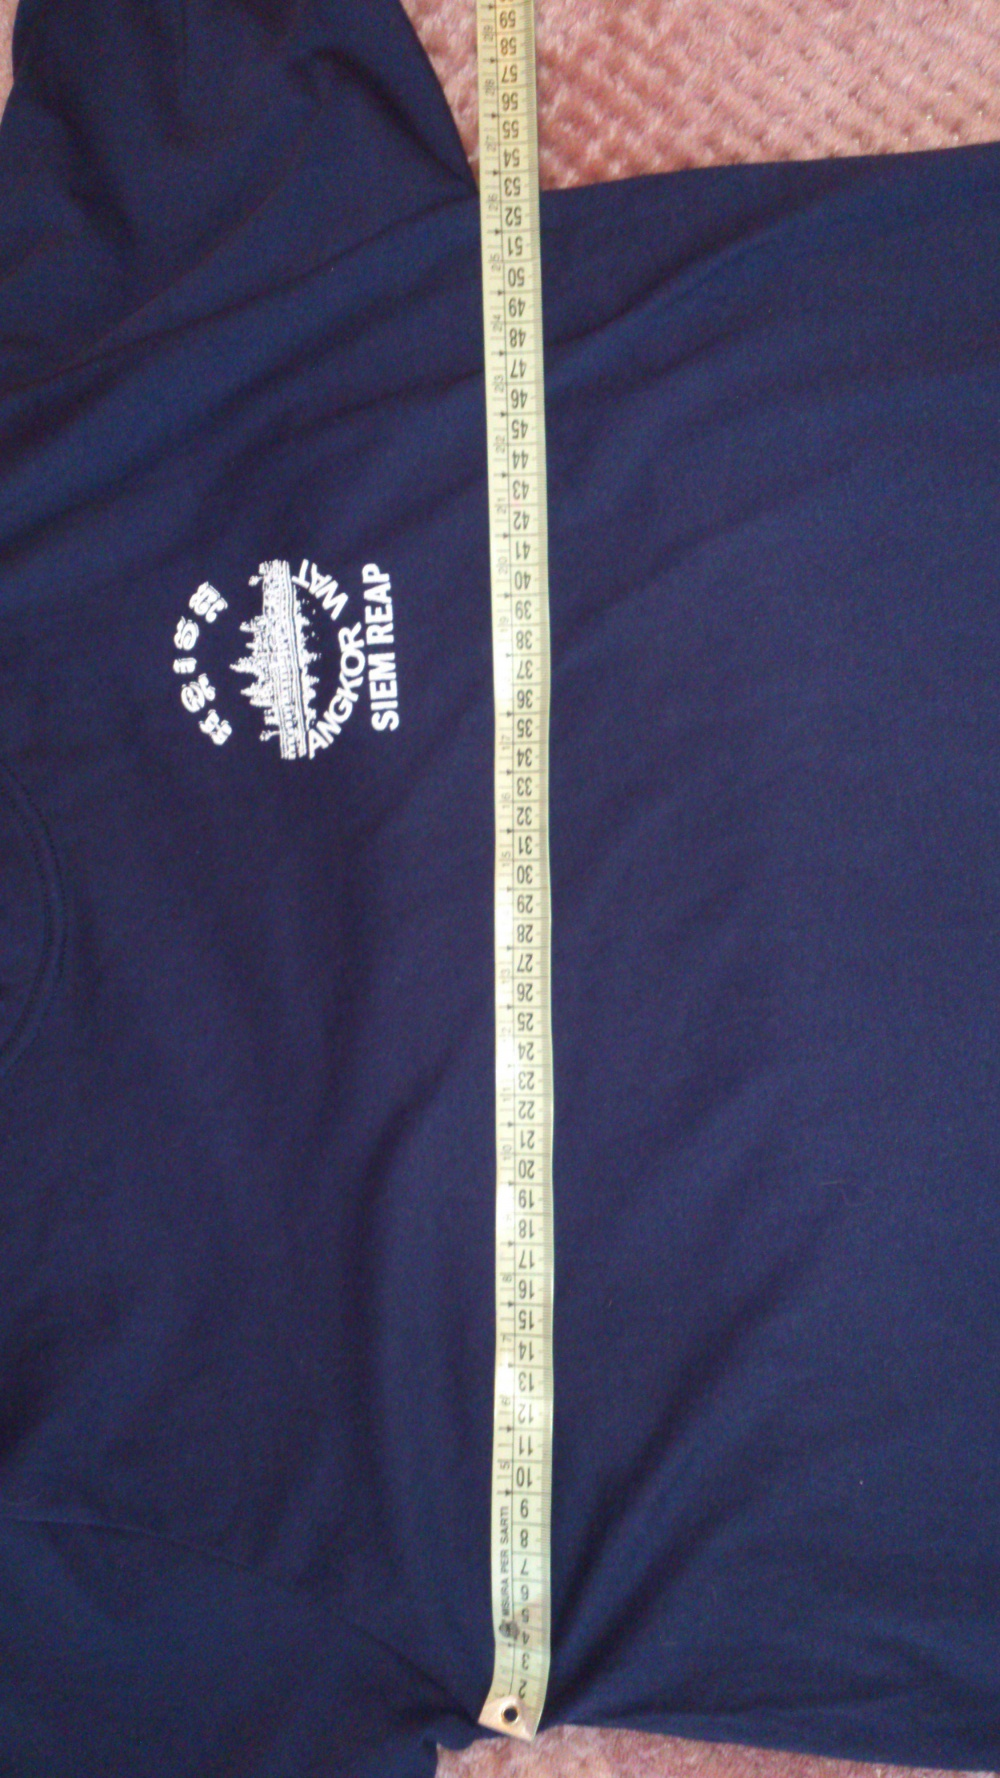 Футболка ANGKOR WAT, размер 48-50